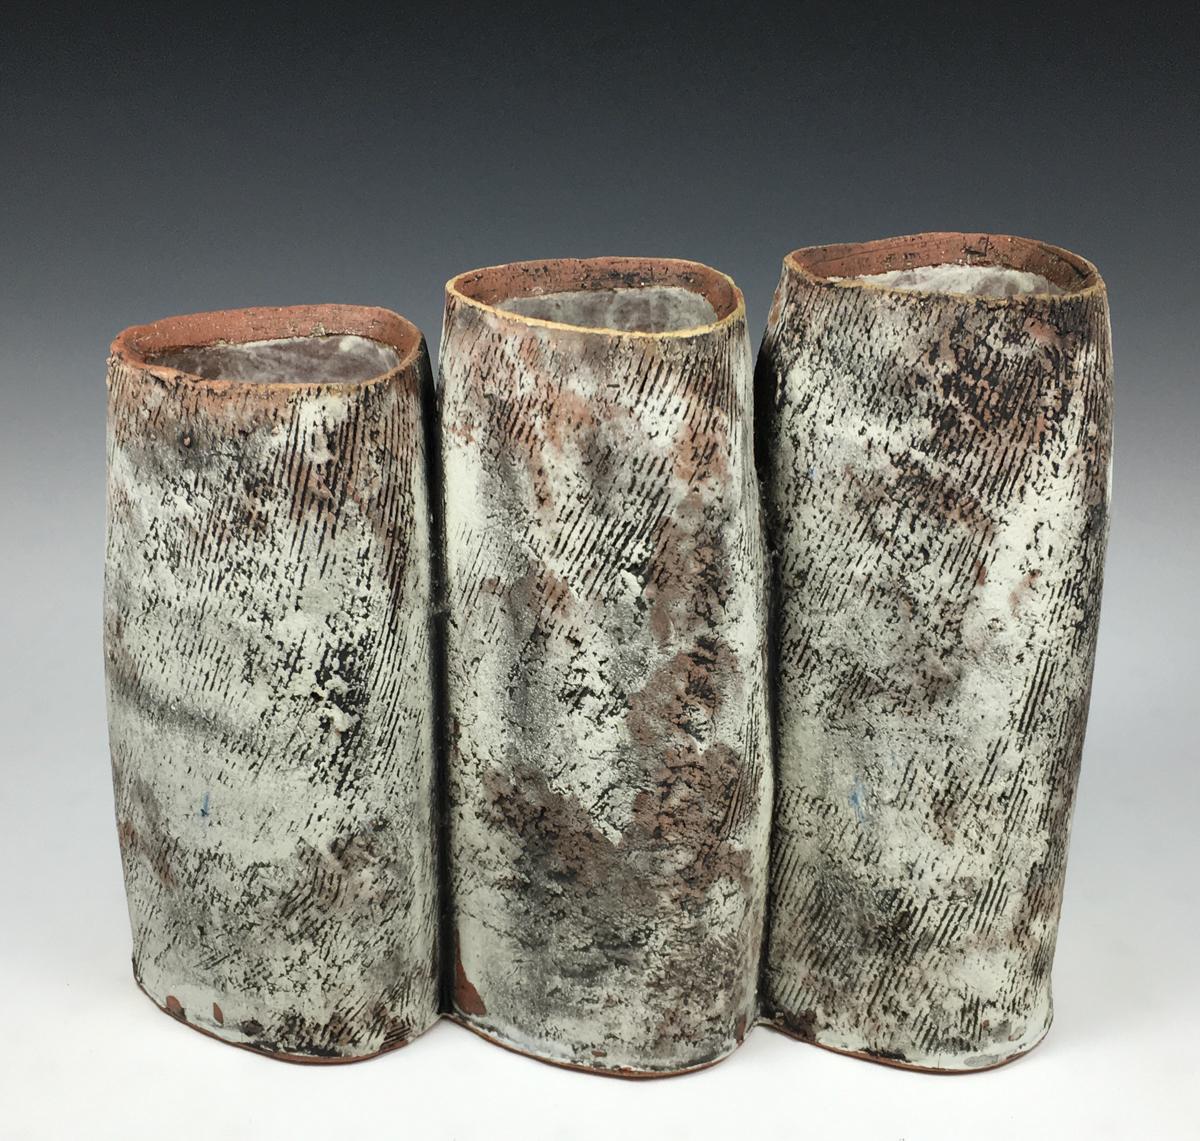 3 Stack Vase